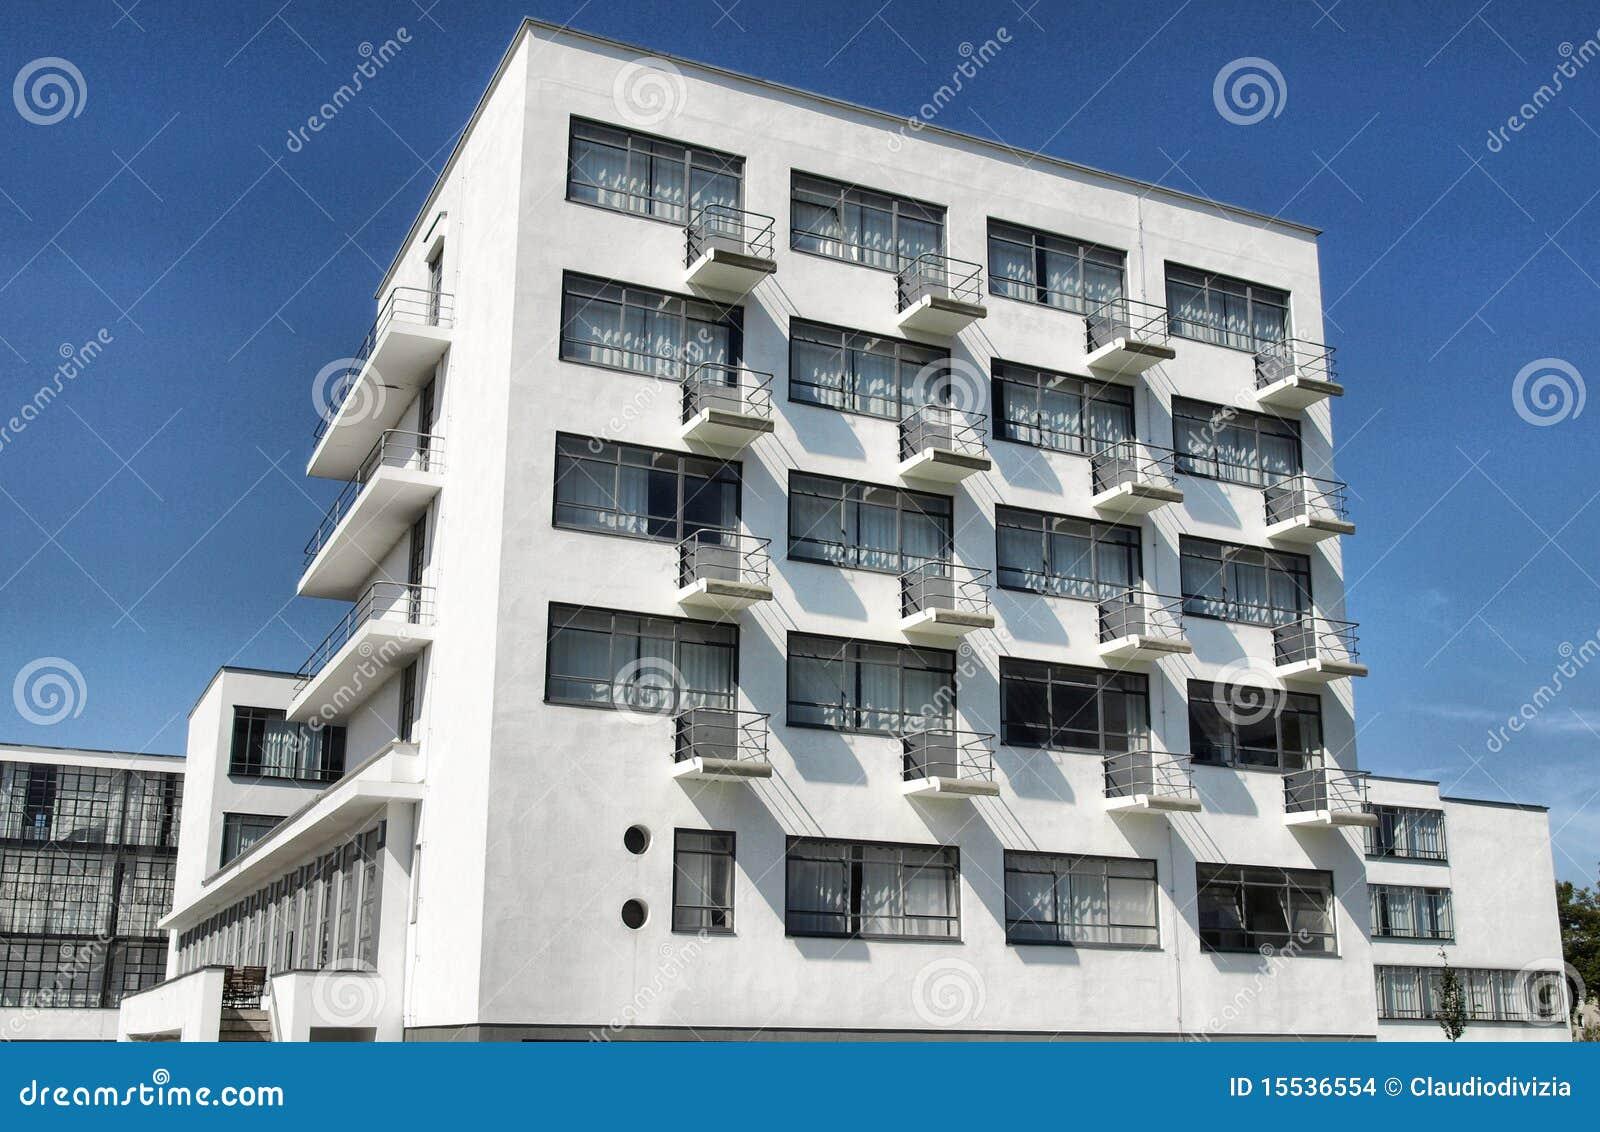 Bauhaus dessau stockbilder bild 15536554 for Bauhaus berlin edificio